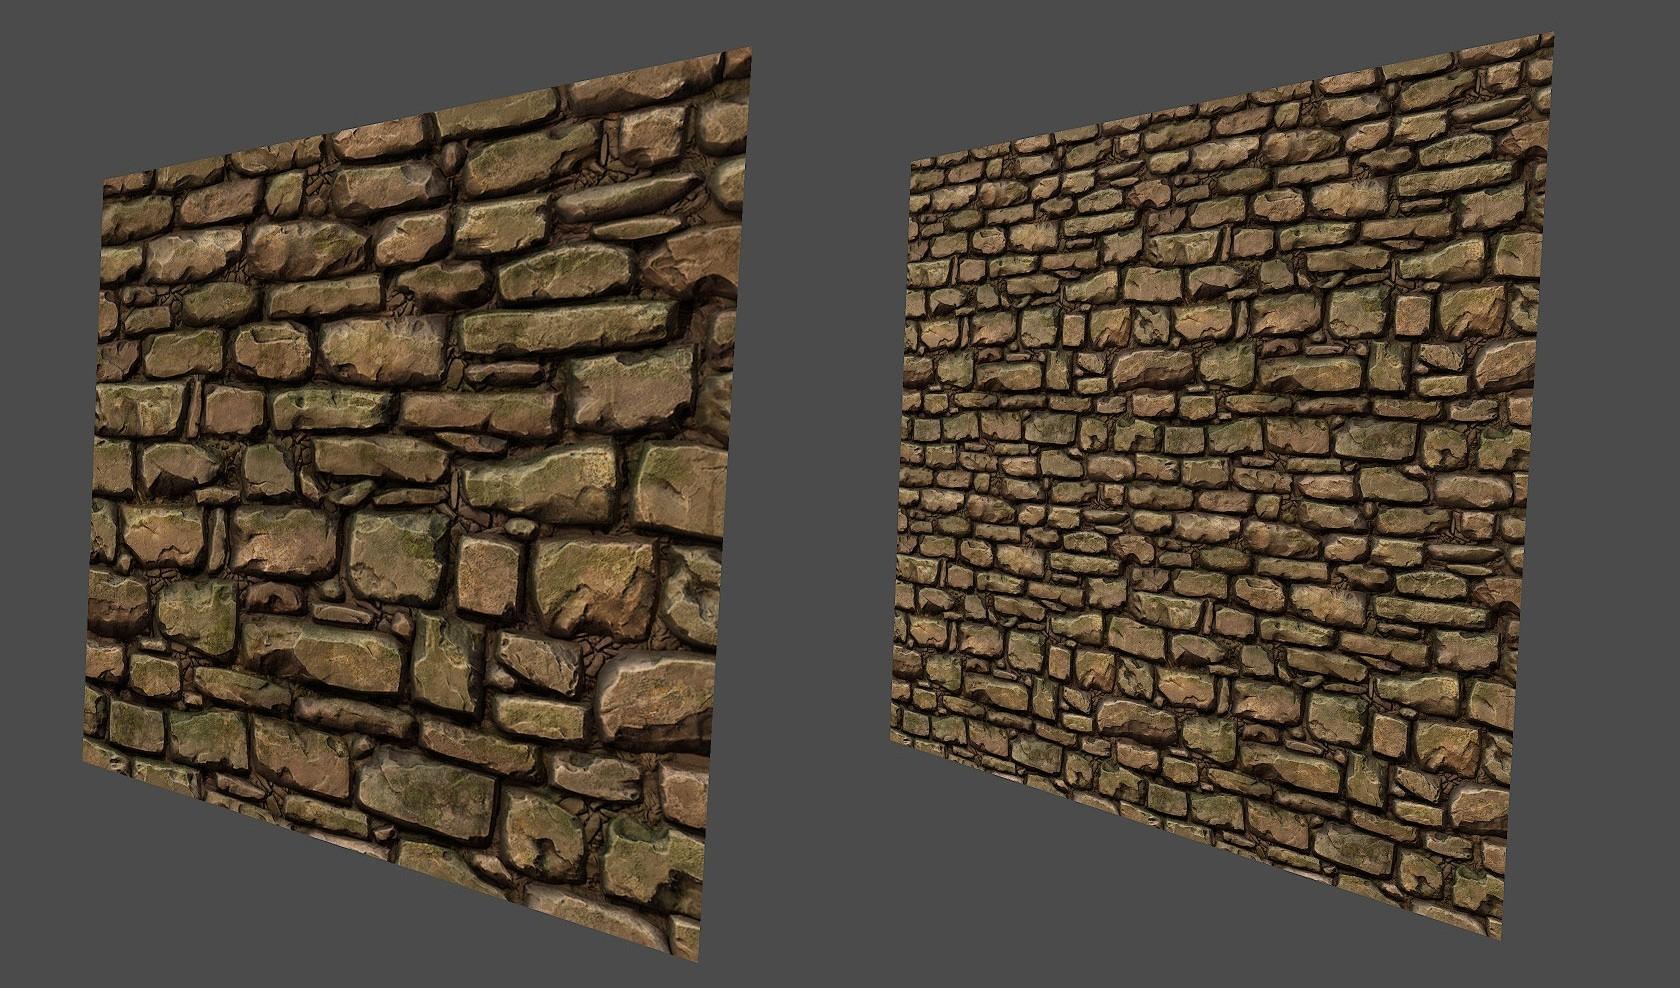 20120817_brick_wall_03.jpg